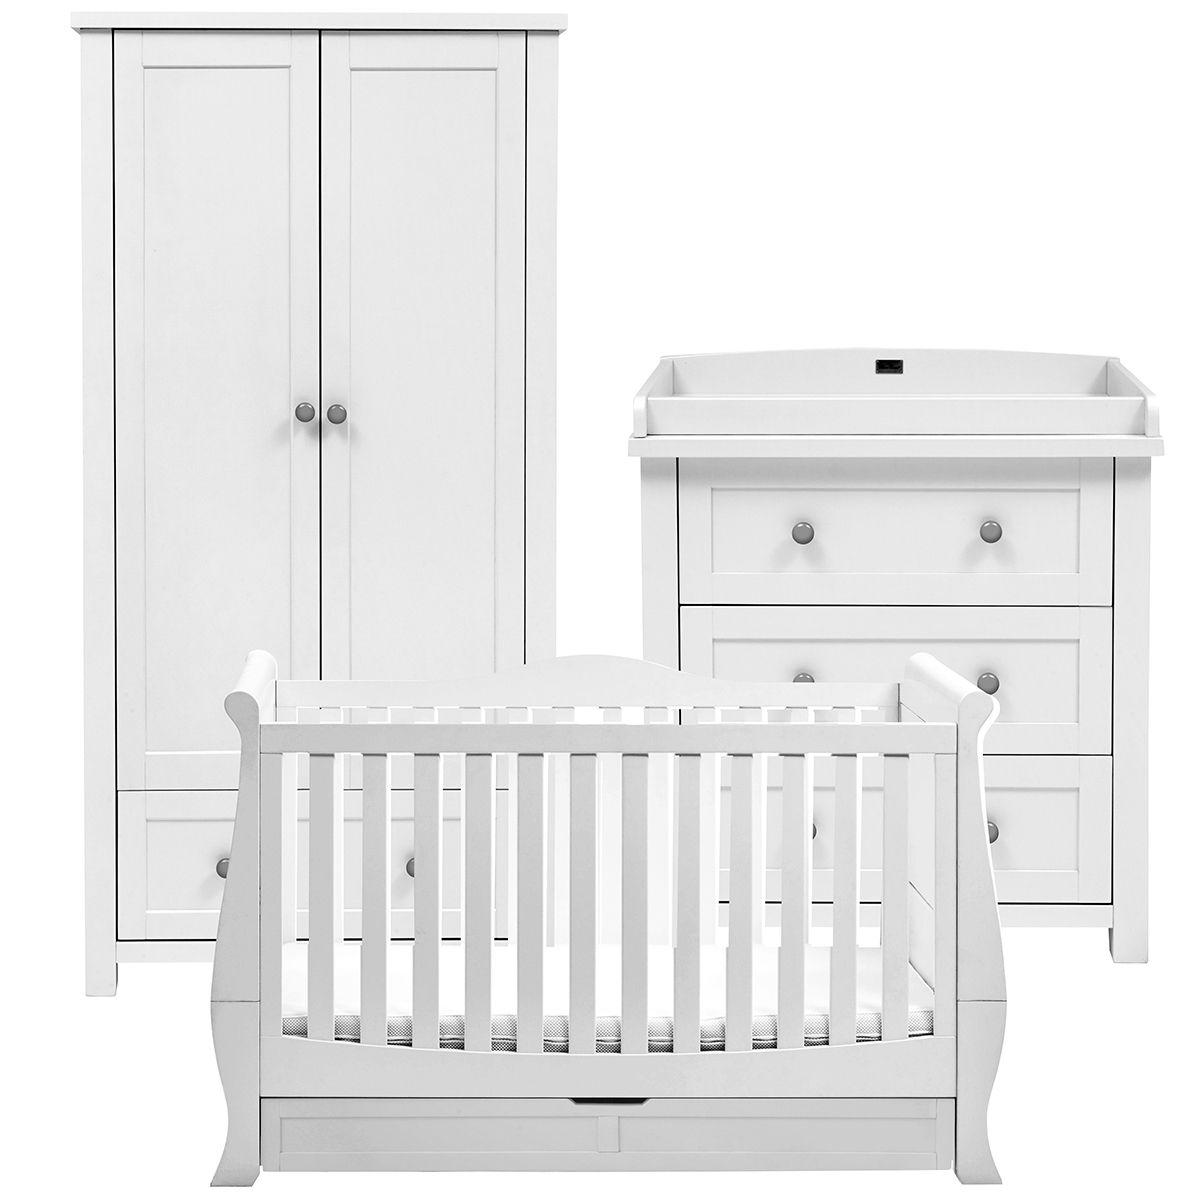 Nostalgia Complete Nursery Set Sleigh Cot Bed Dresser Wardrobe Sleigh Cot Bed Cot Bedding Nursery Furniture Sets